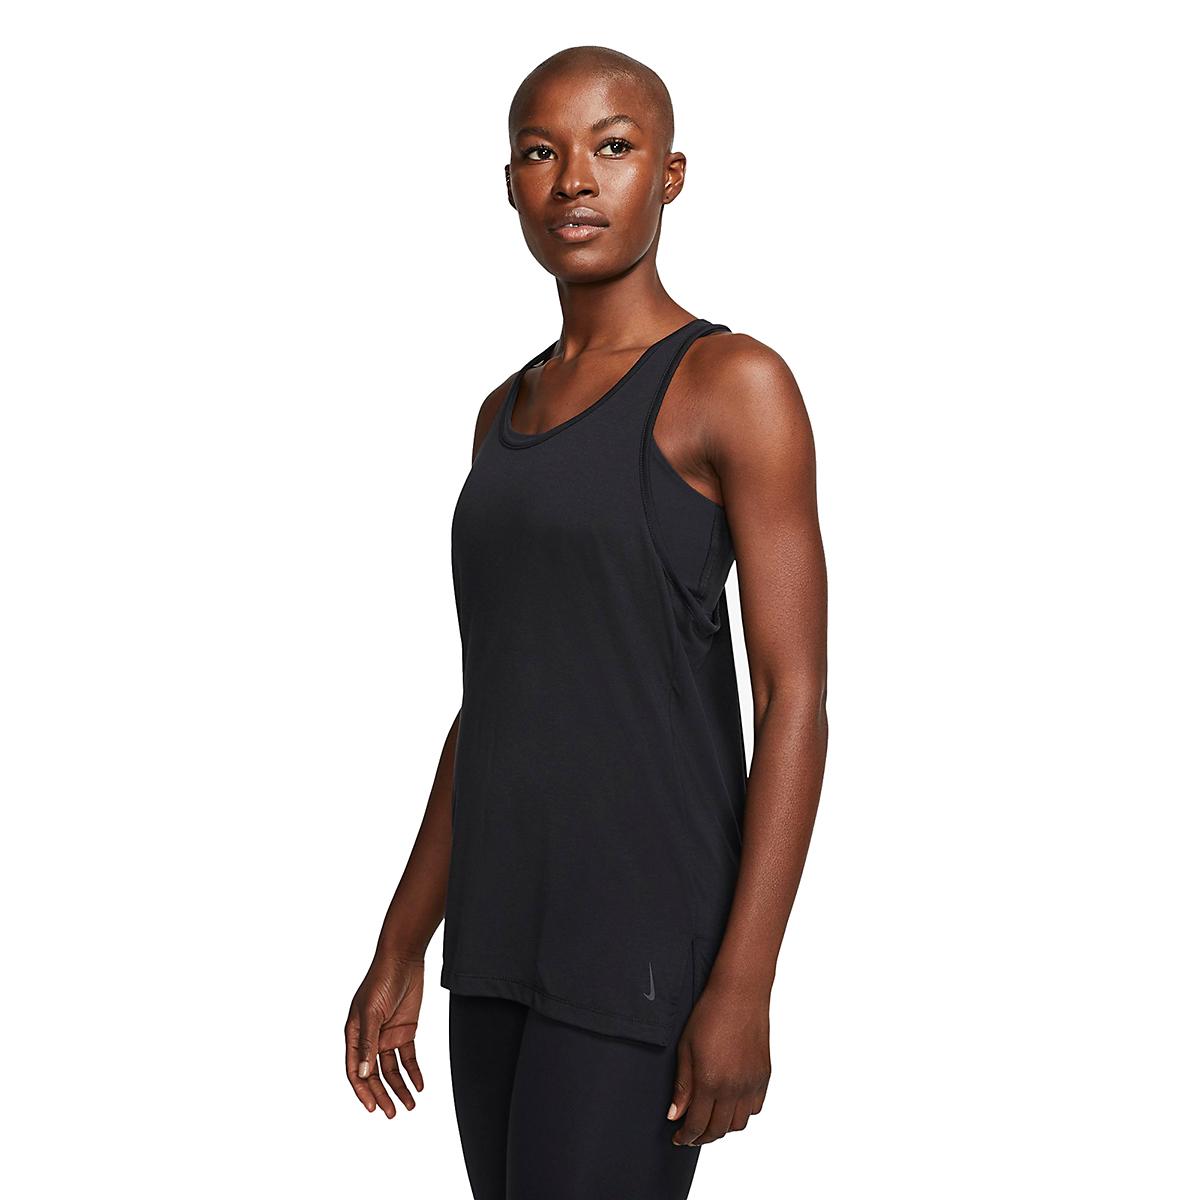 Women's Nike Yoga Layer Tank - Color: Black/Dark Smoke Grey - Size: XS, Black/Dark Smoke Grey, large, image 2